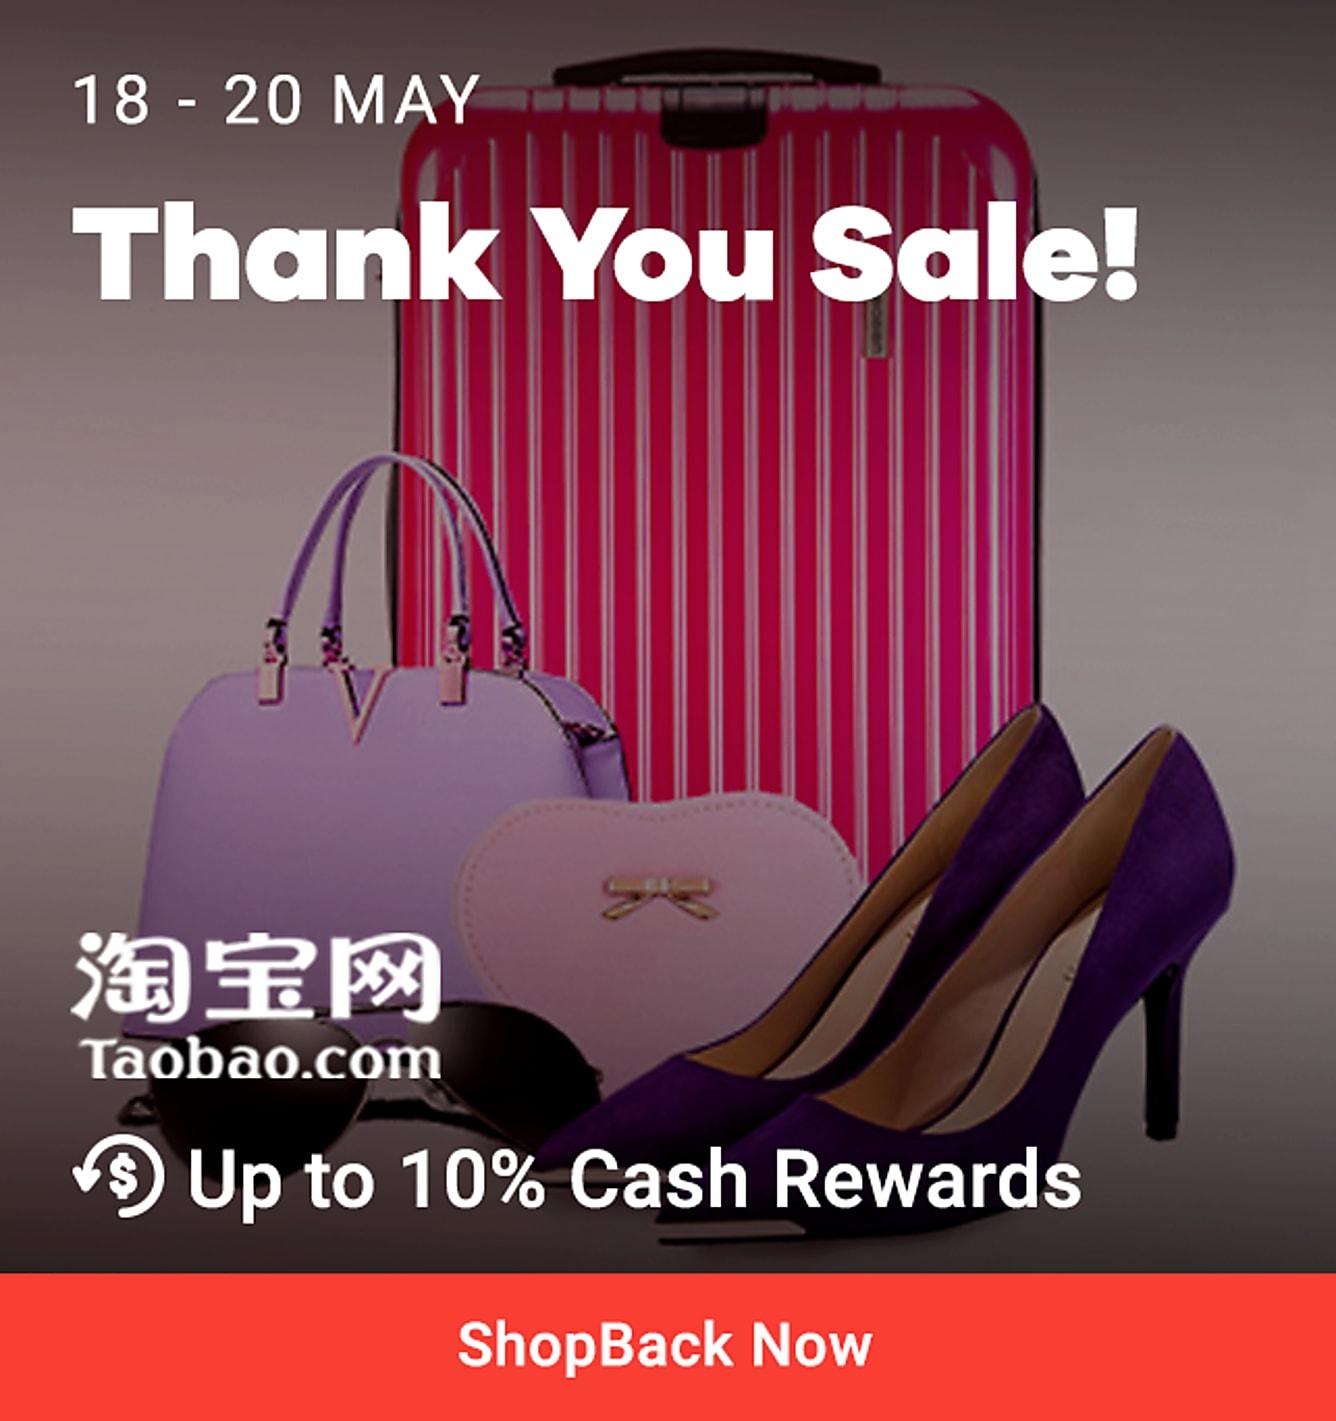 taobao thank you sale